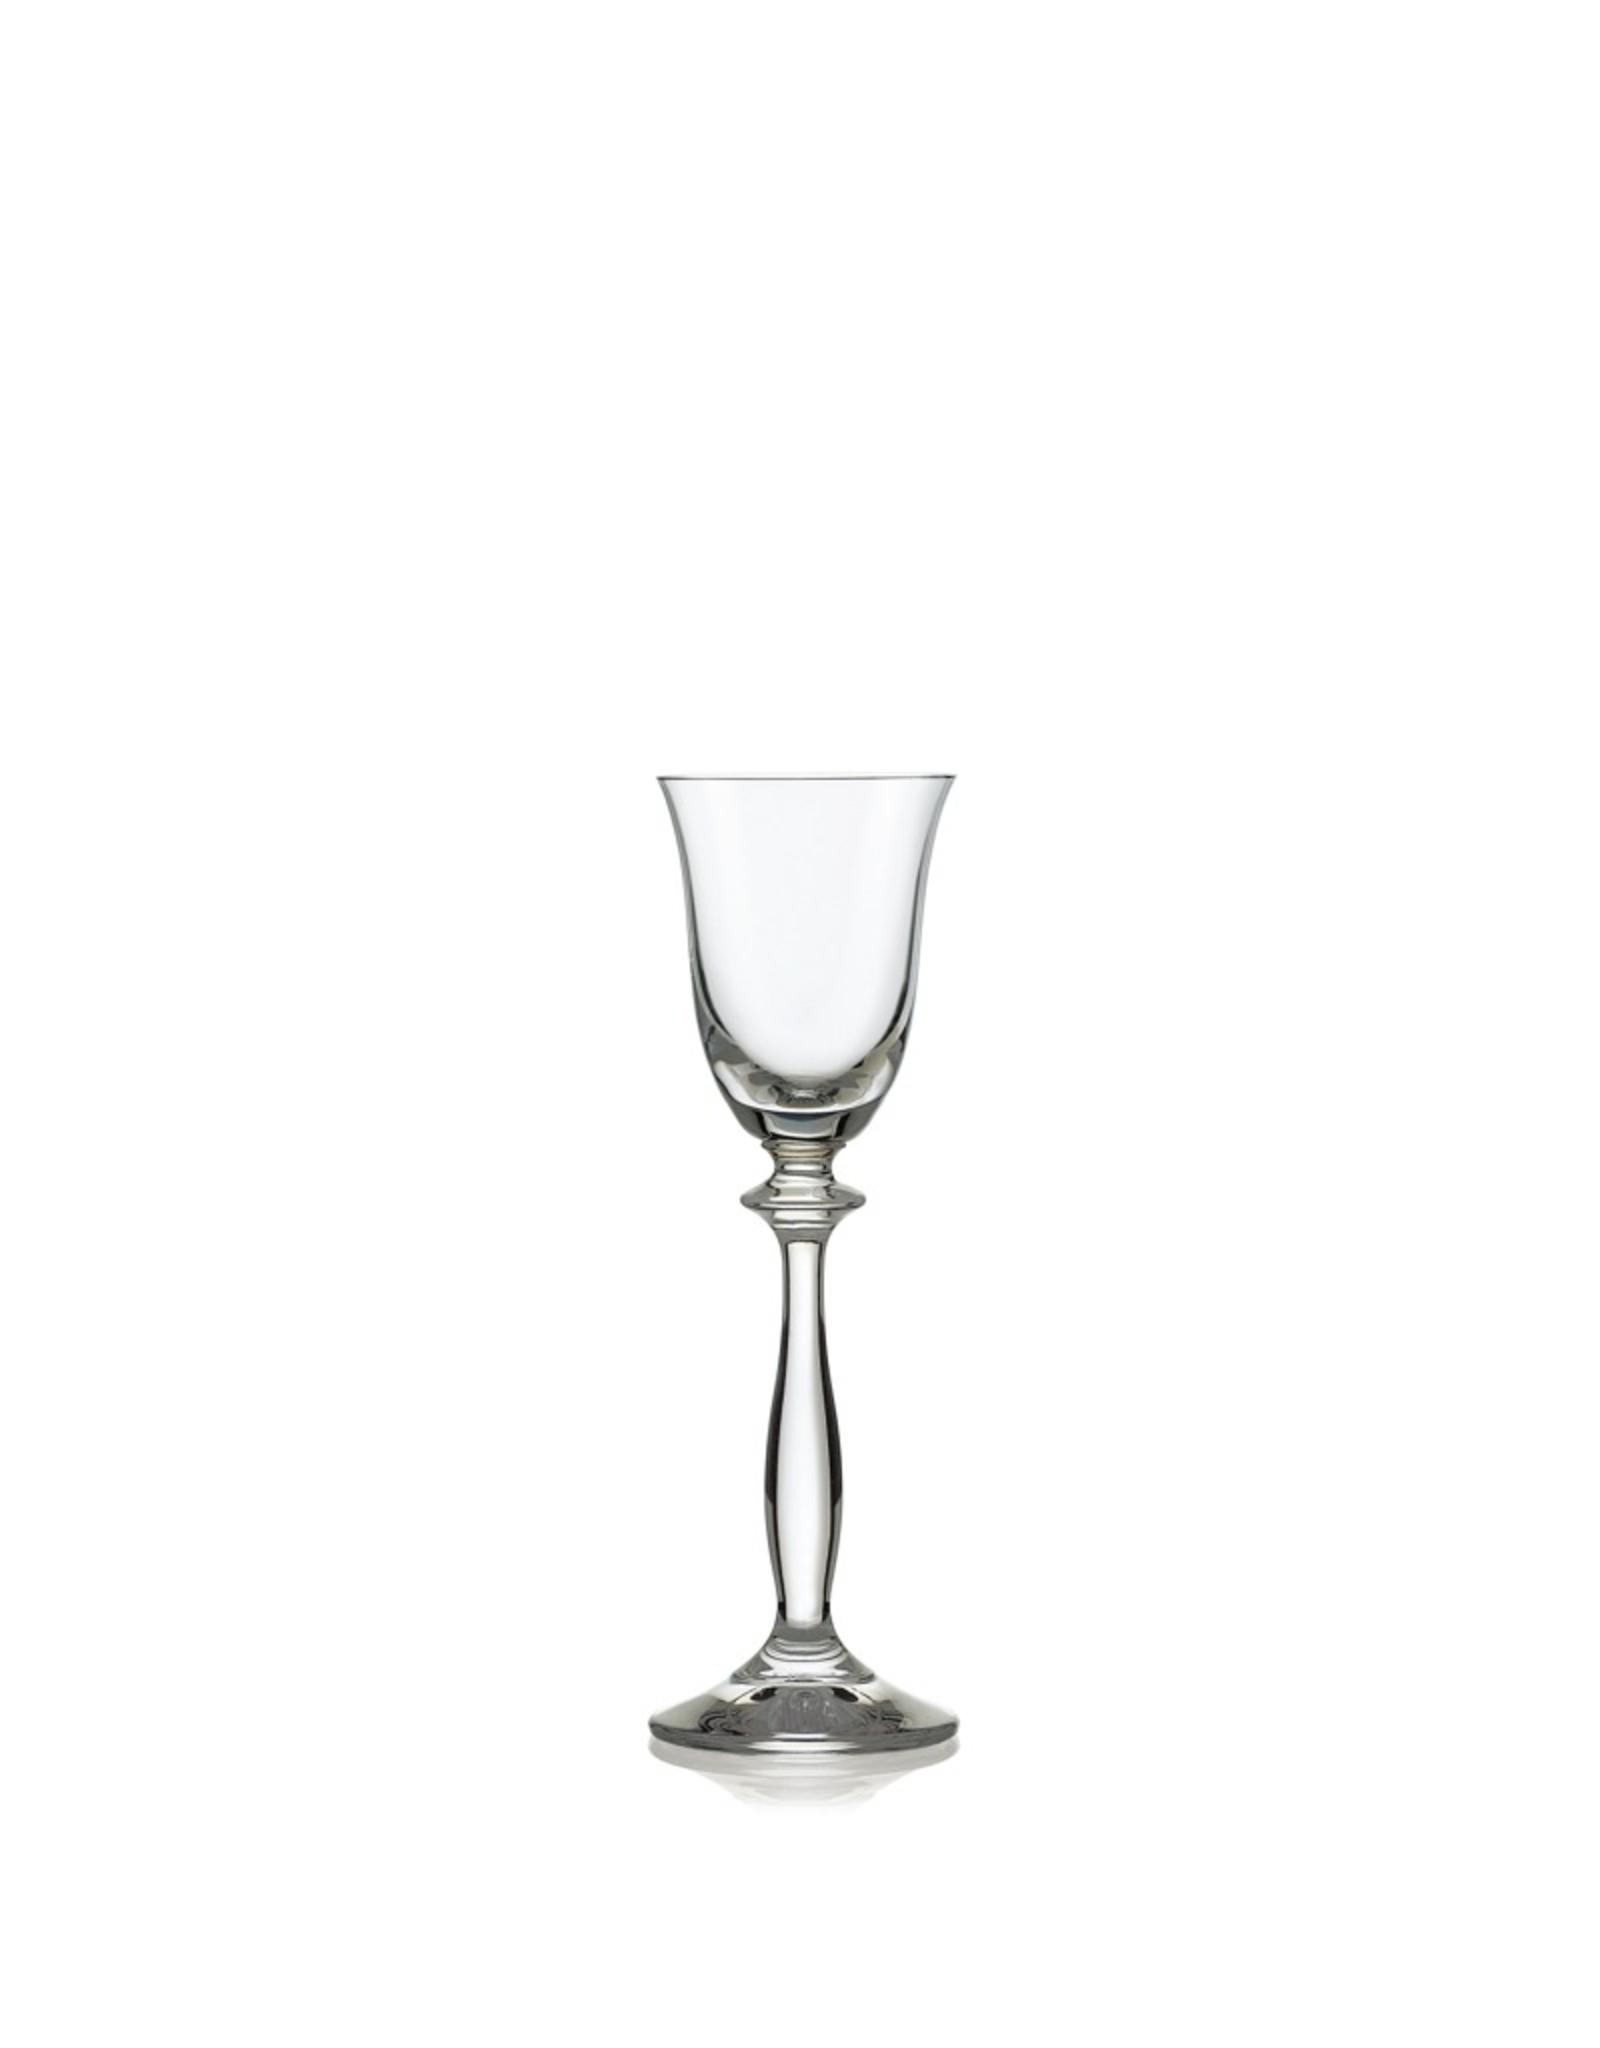 Crystalex Kristallen likeurglas Angela 60 ml /6st